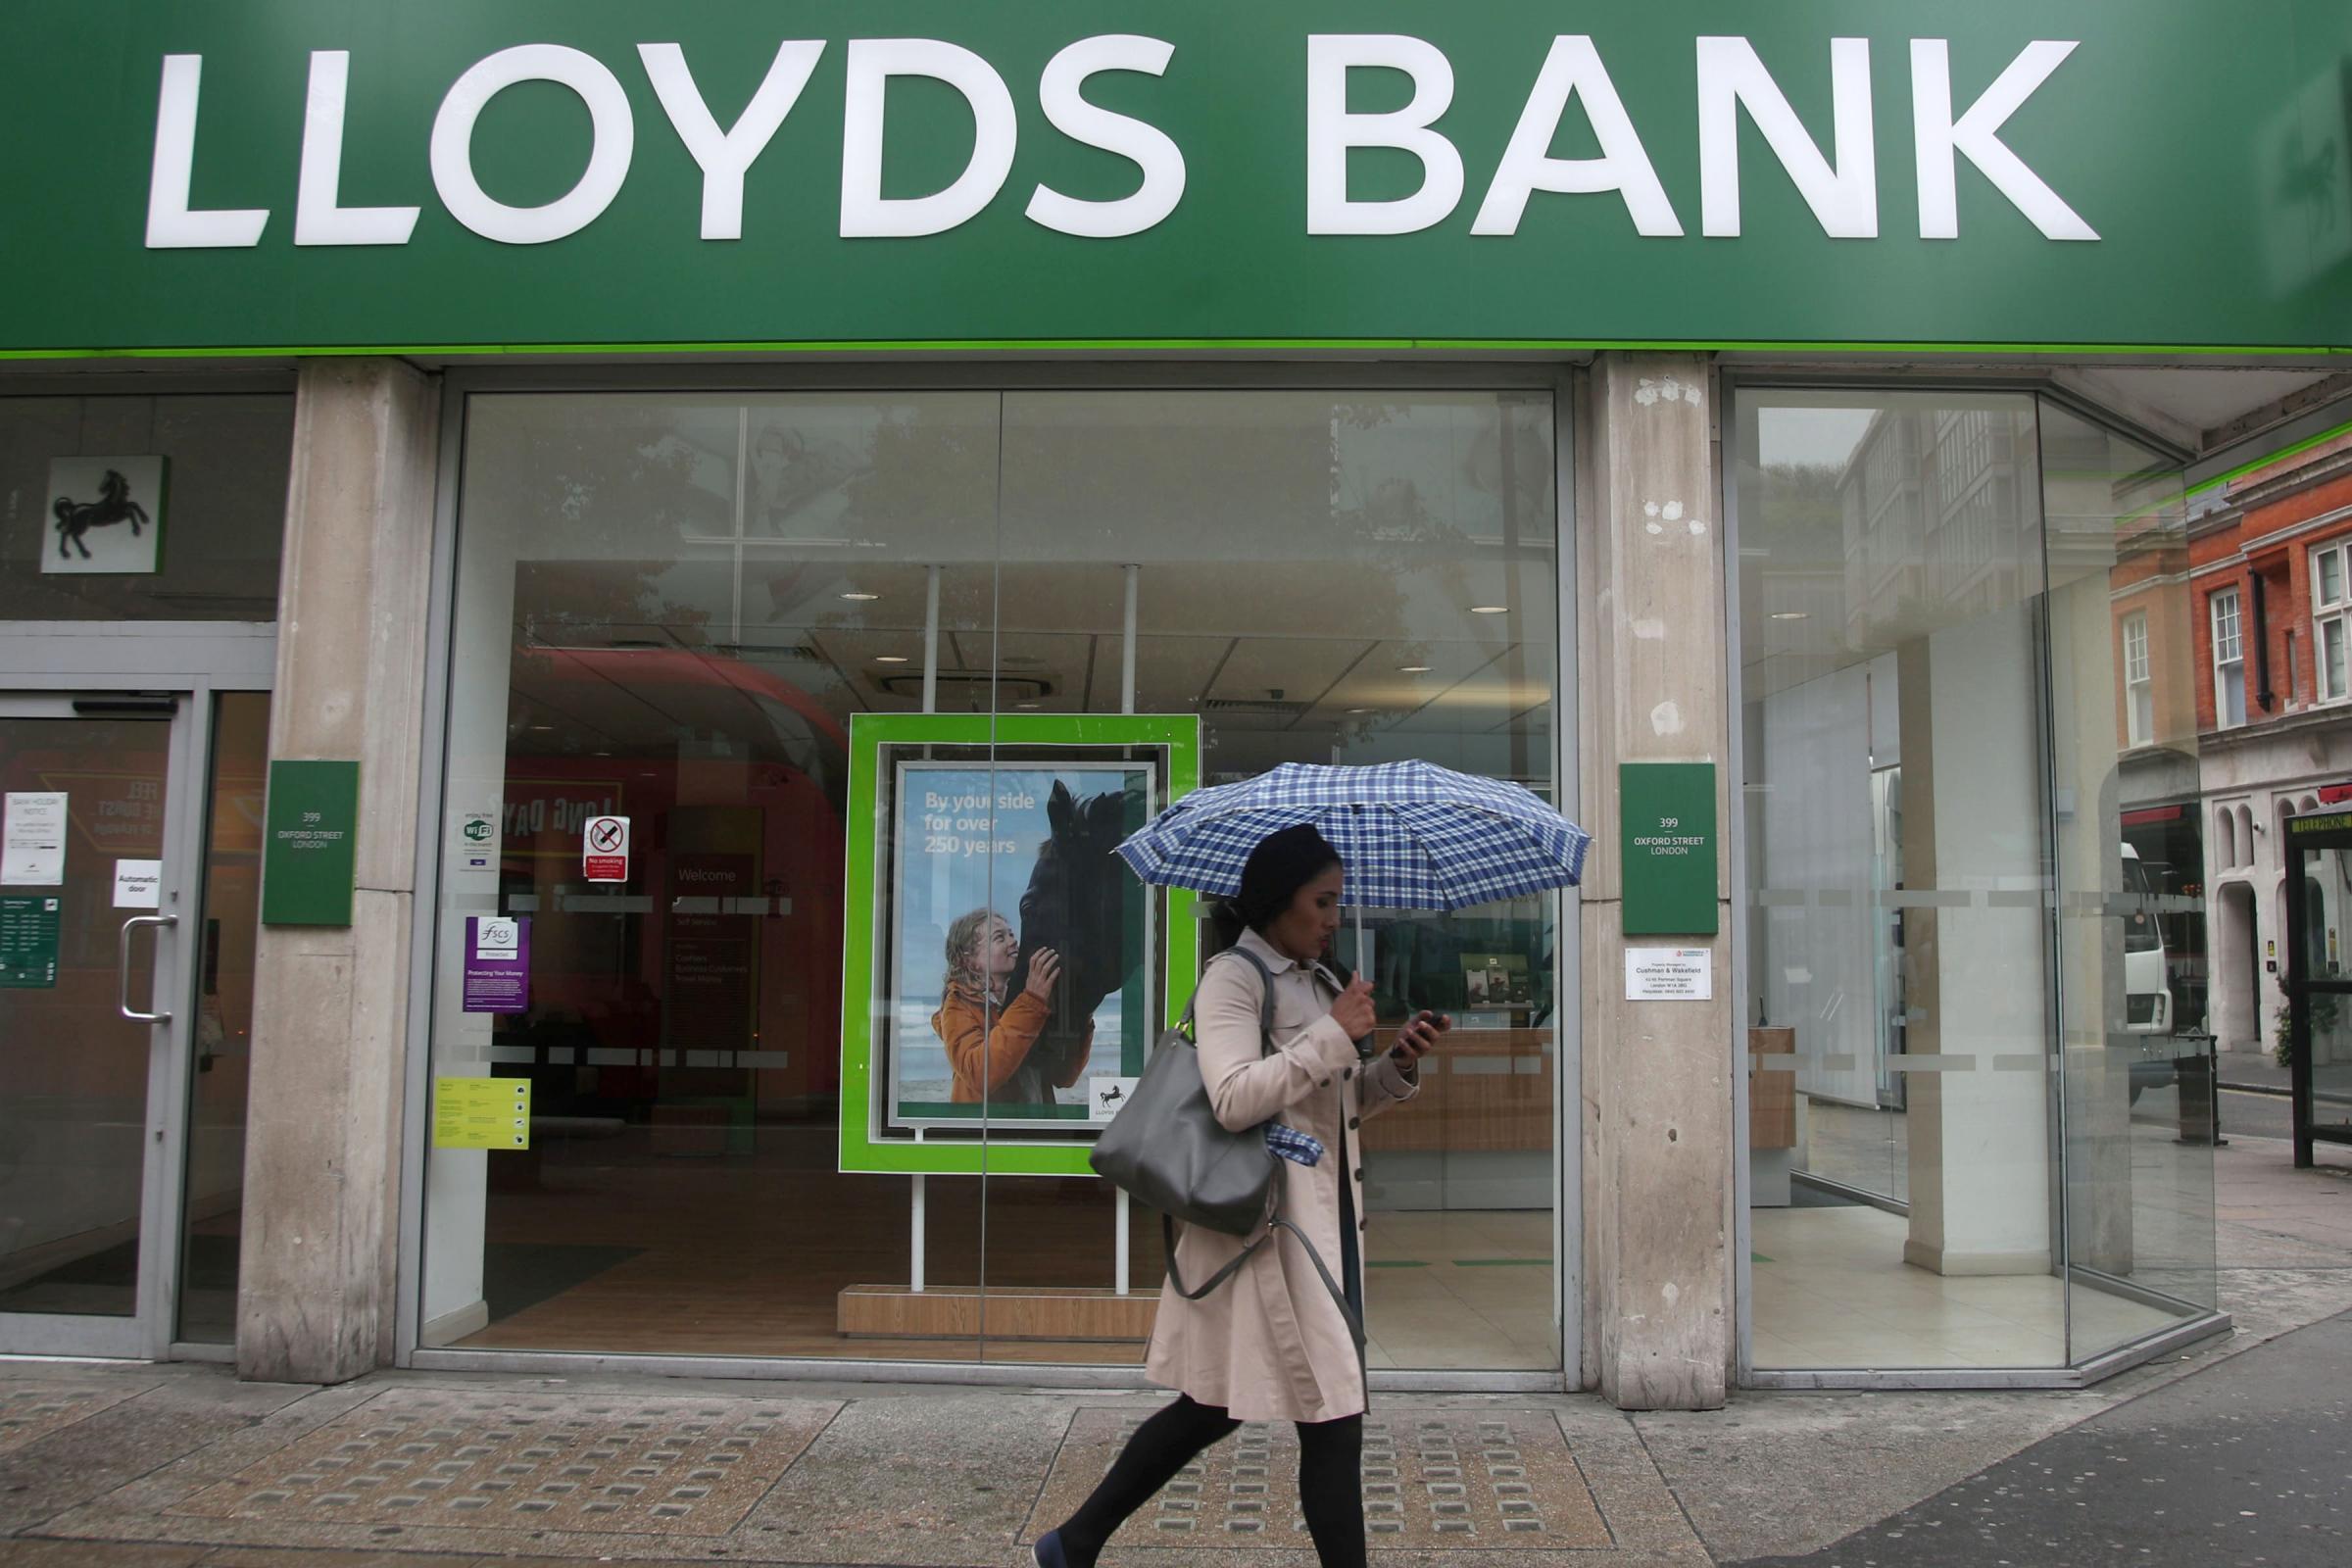 Lloyds' digital overhaul puts thousands of jobs at risk